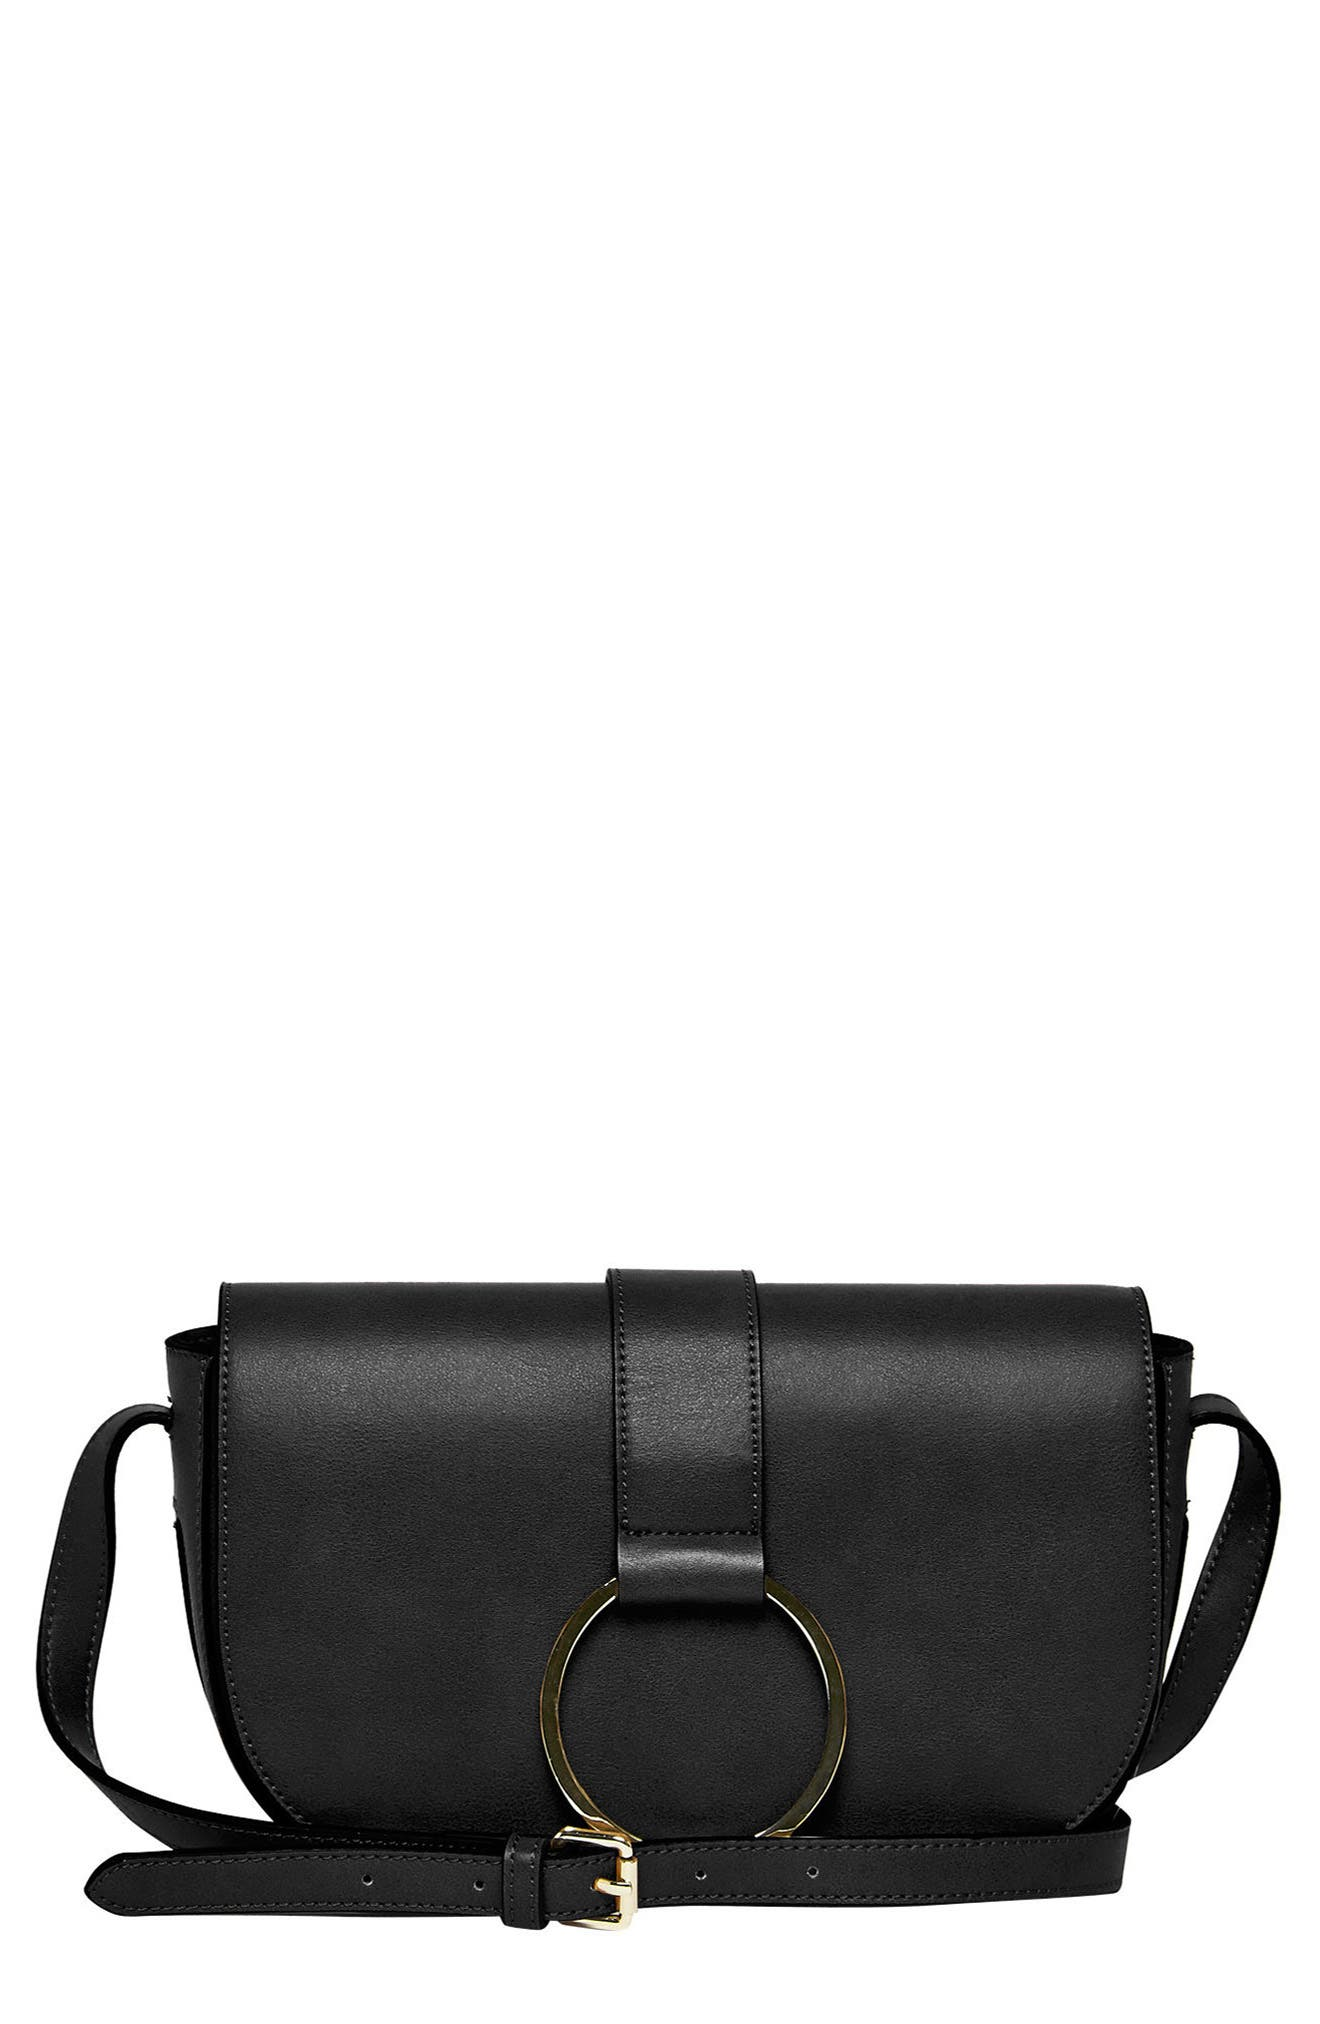 Lola Vegan Leather Crossbody Saddle Bag,                         Main,                         color, 001